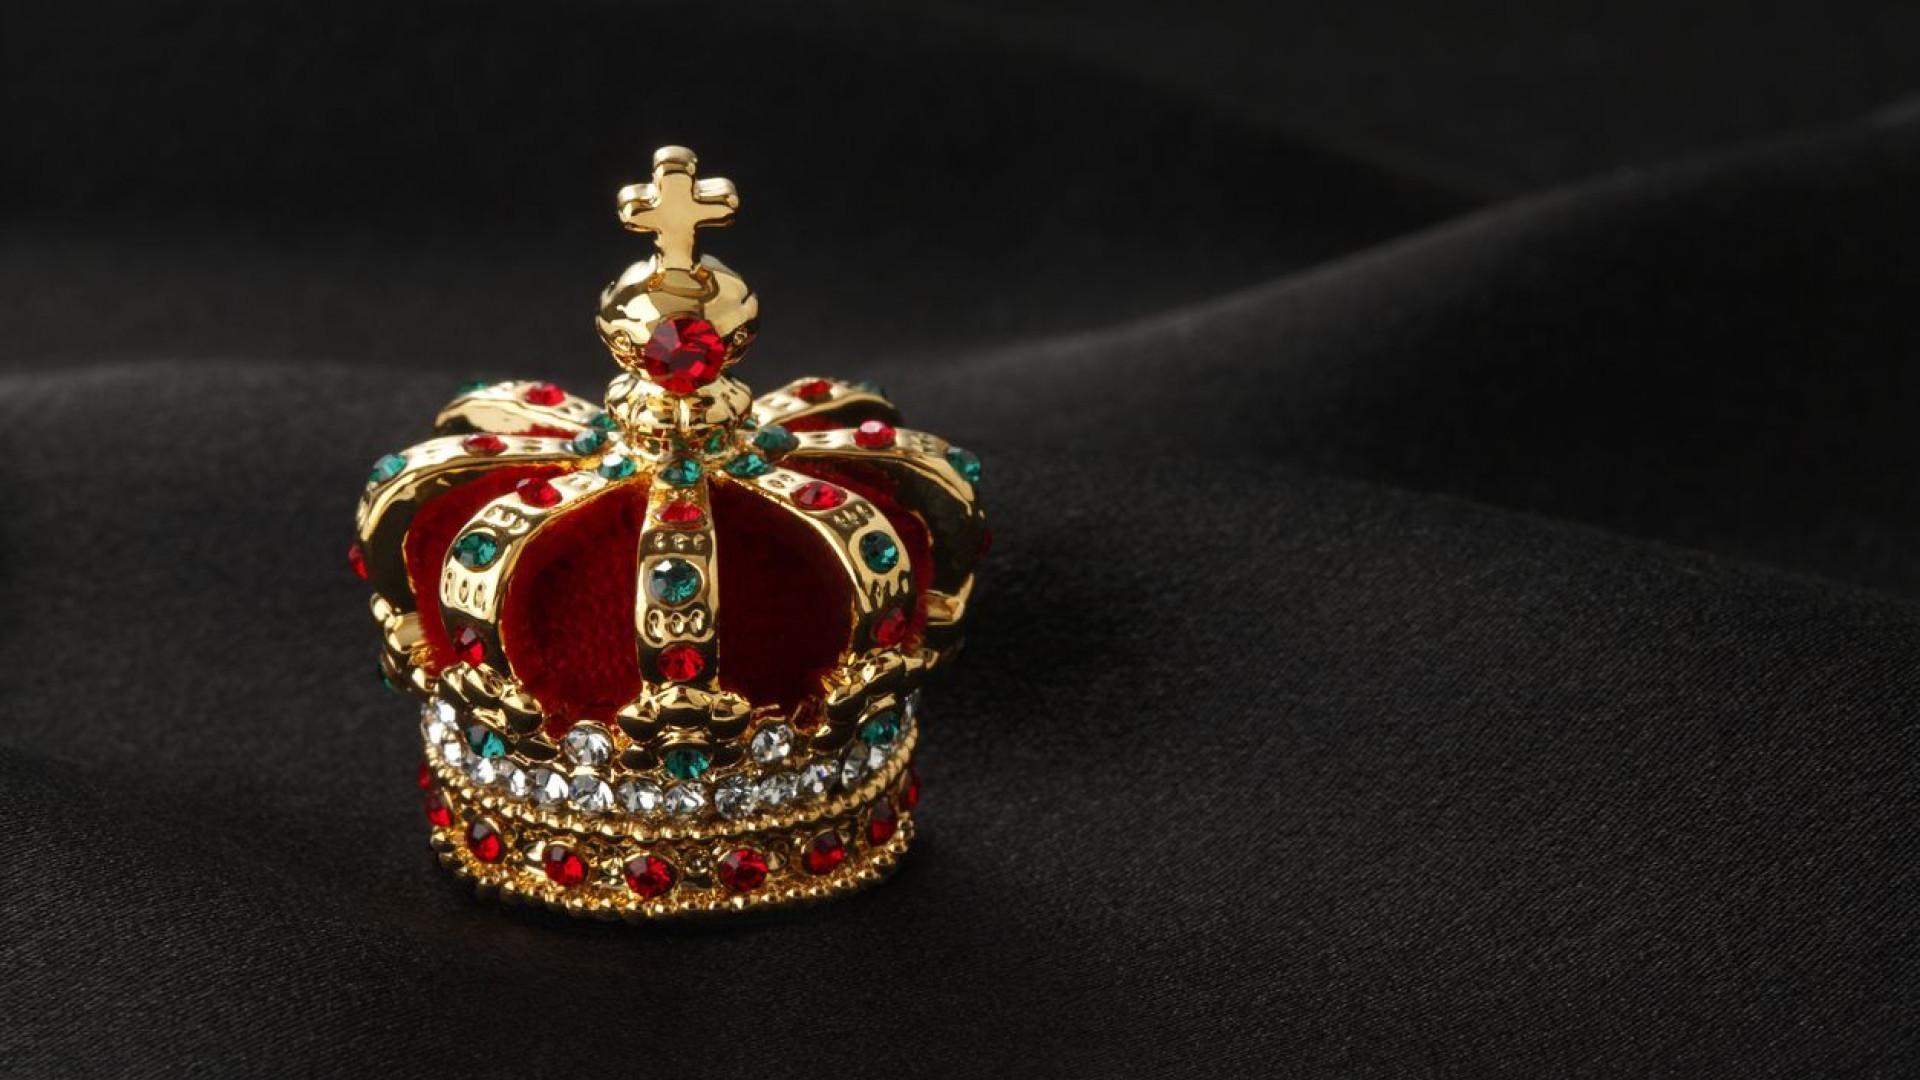 Há novo volume de 'Casamentos da Família Real Portuguesa' esta semana